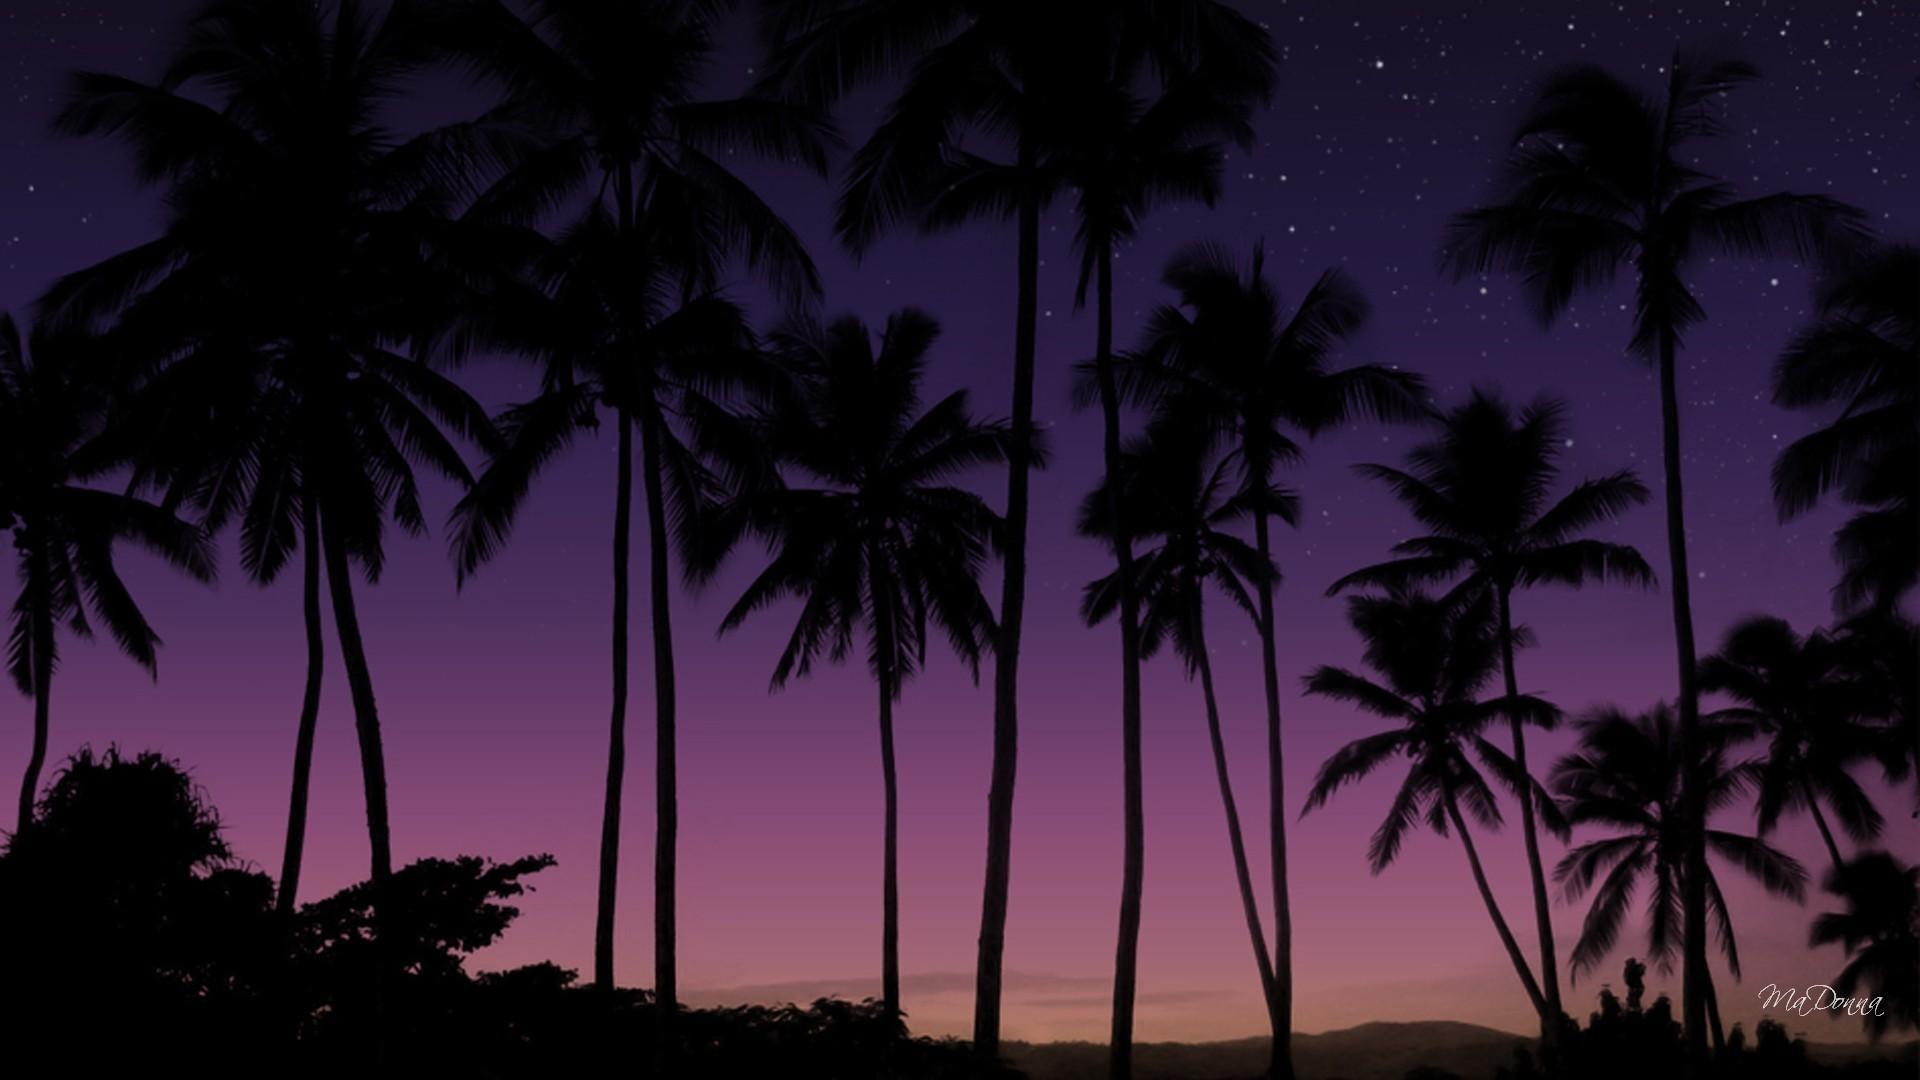 Purple Drank Wallpapers – LEAN APK Direct Download – Free .